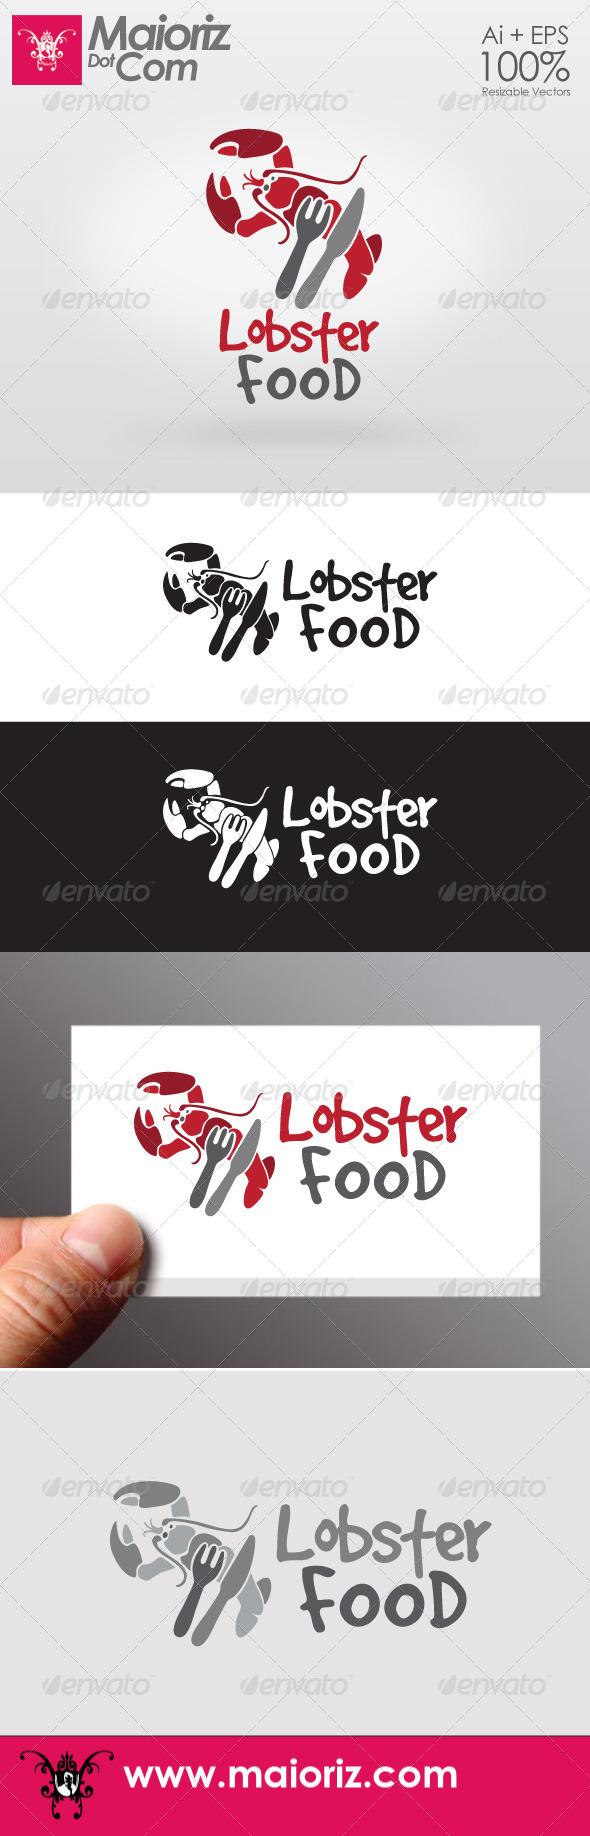 Lobster Food Logo - Food Logo Templates